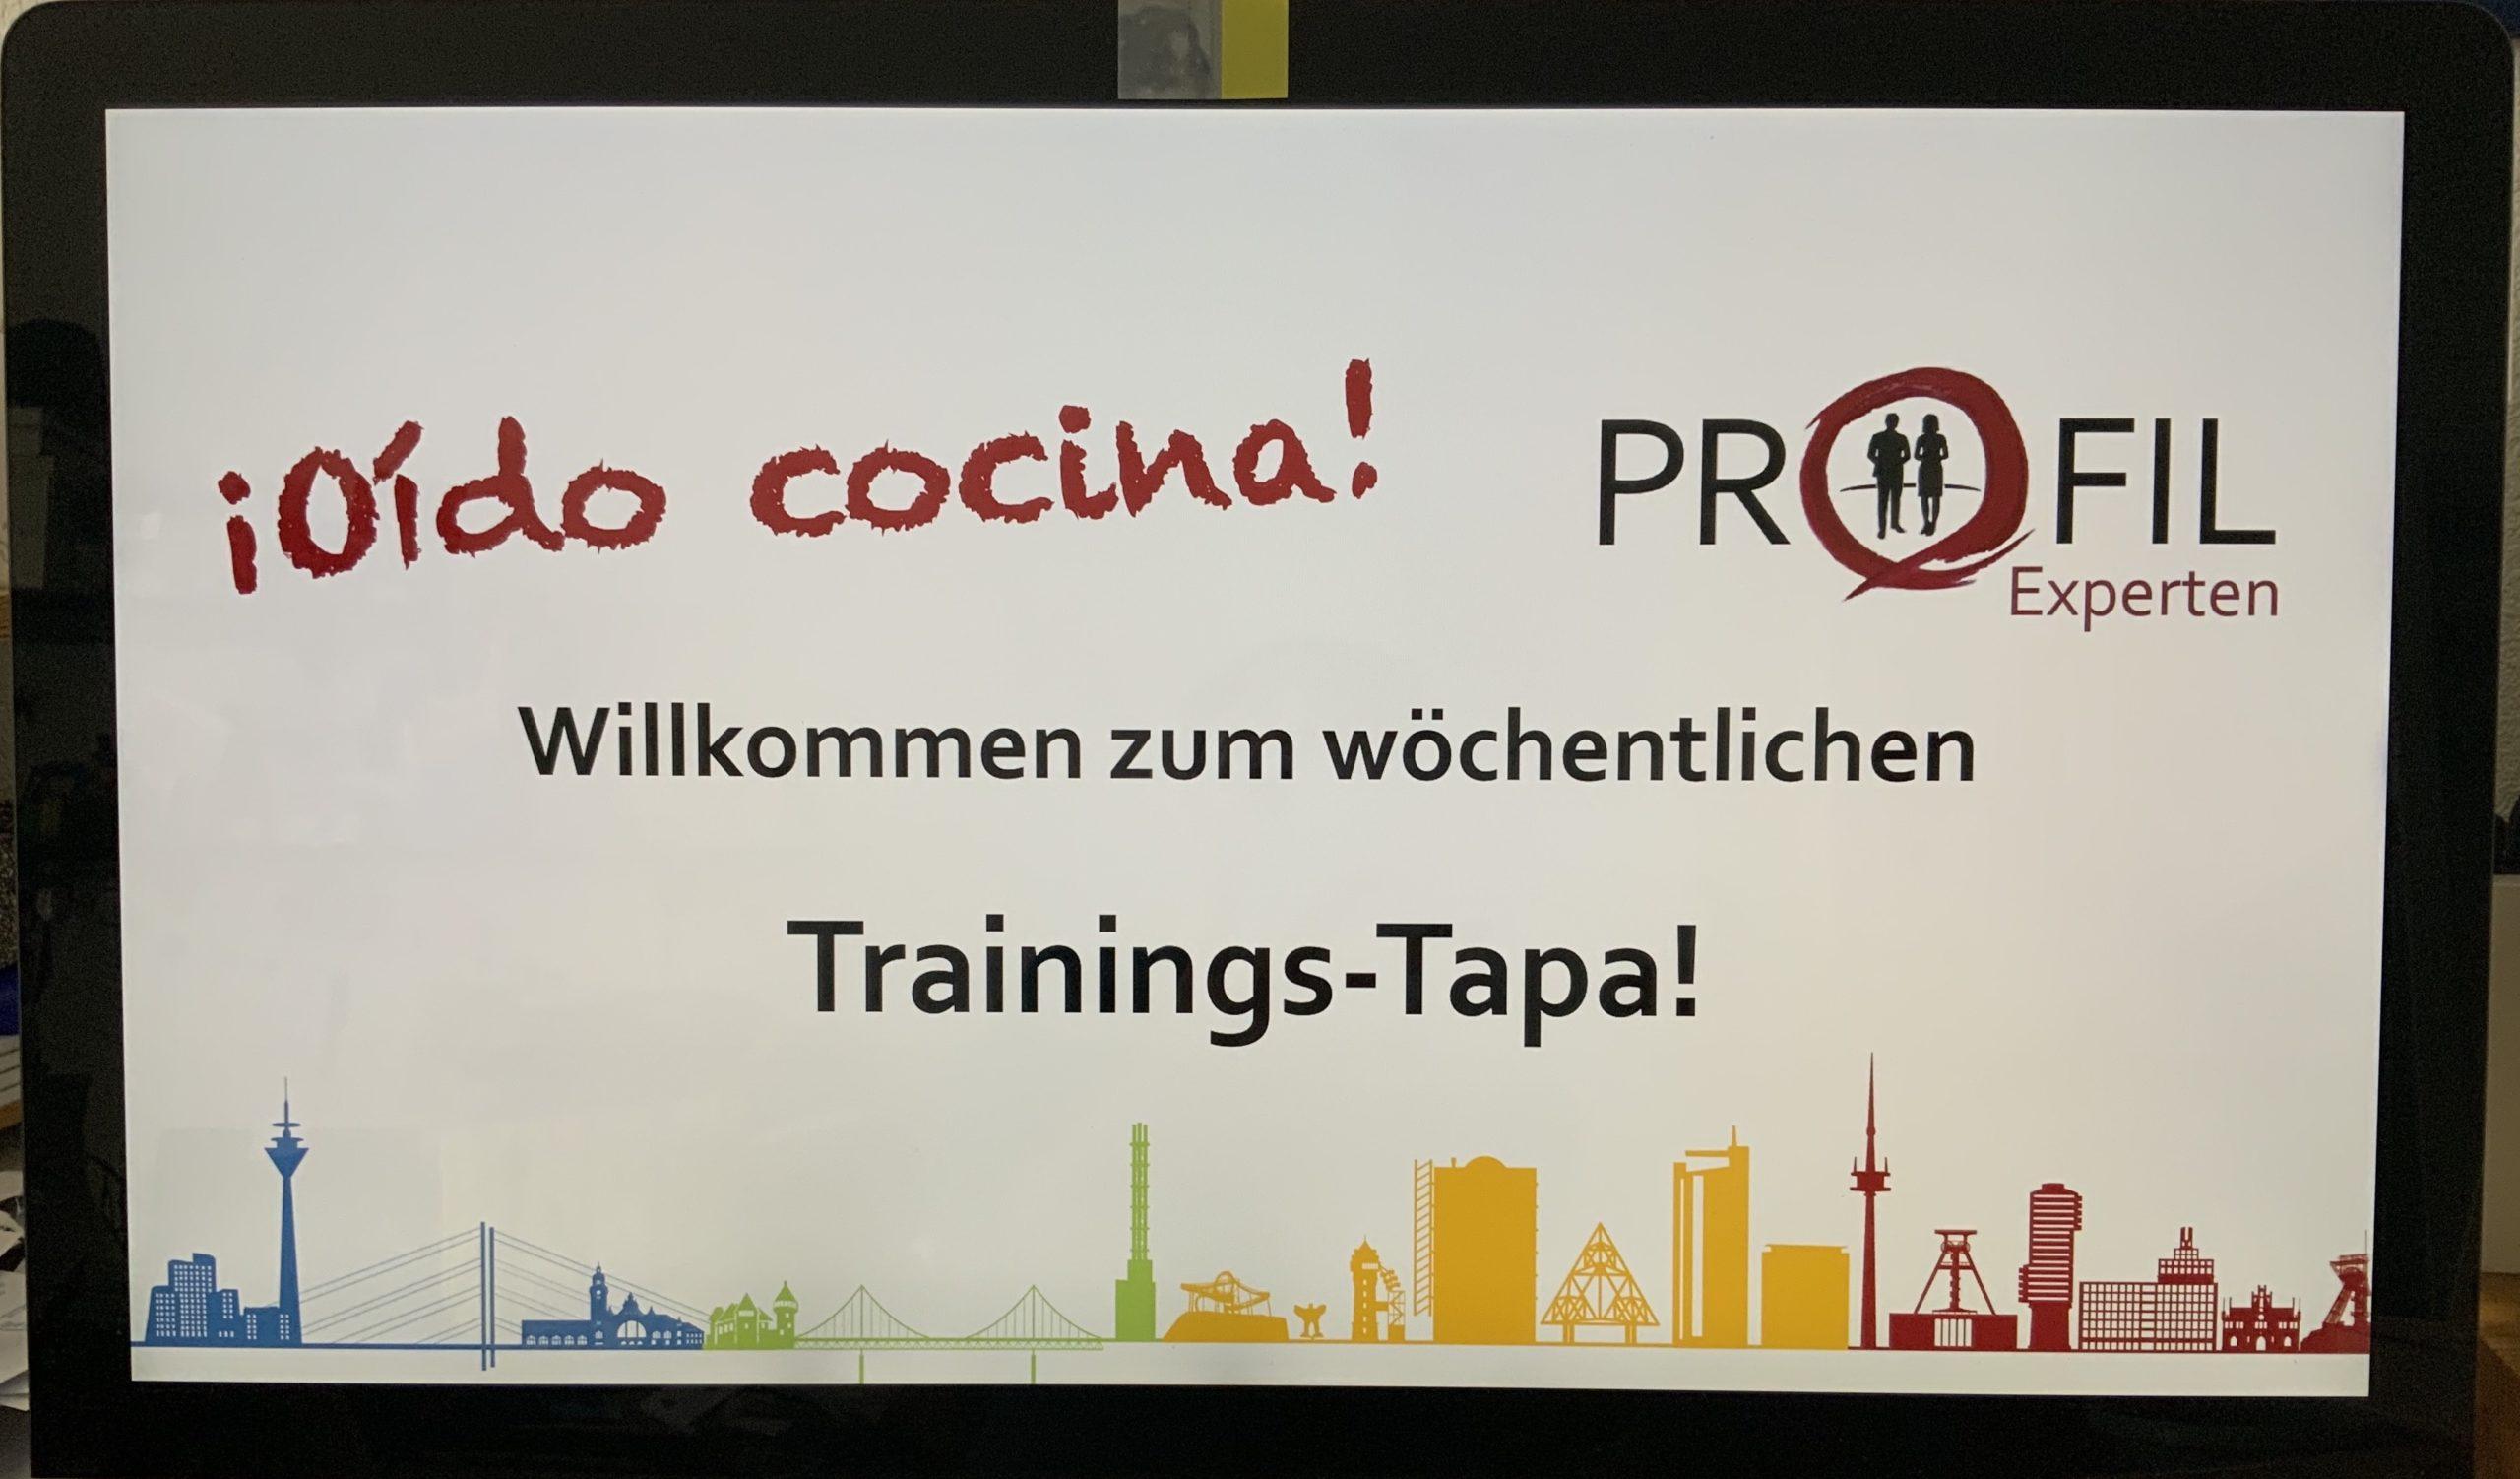 Trainings-Tapa der PROFIL-Experten